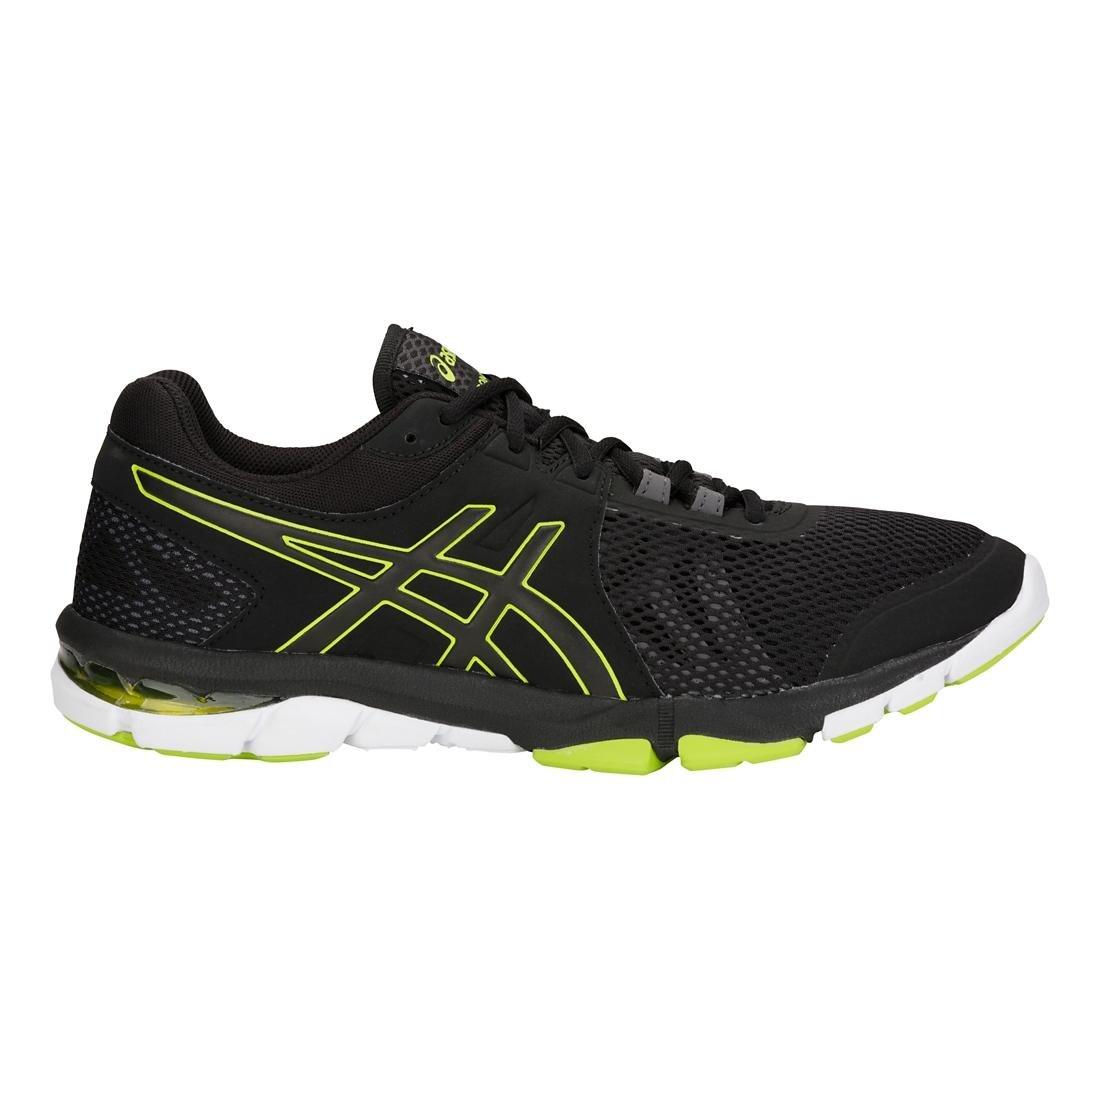 ASICS Mens Gel-Craze TR 4 Black/Neon Lime Cross Trainer - 9